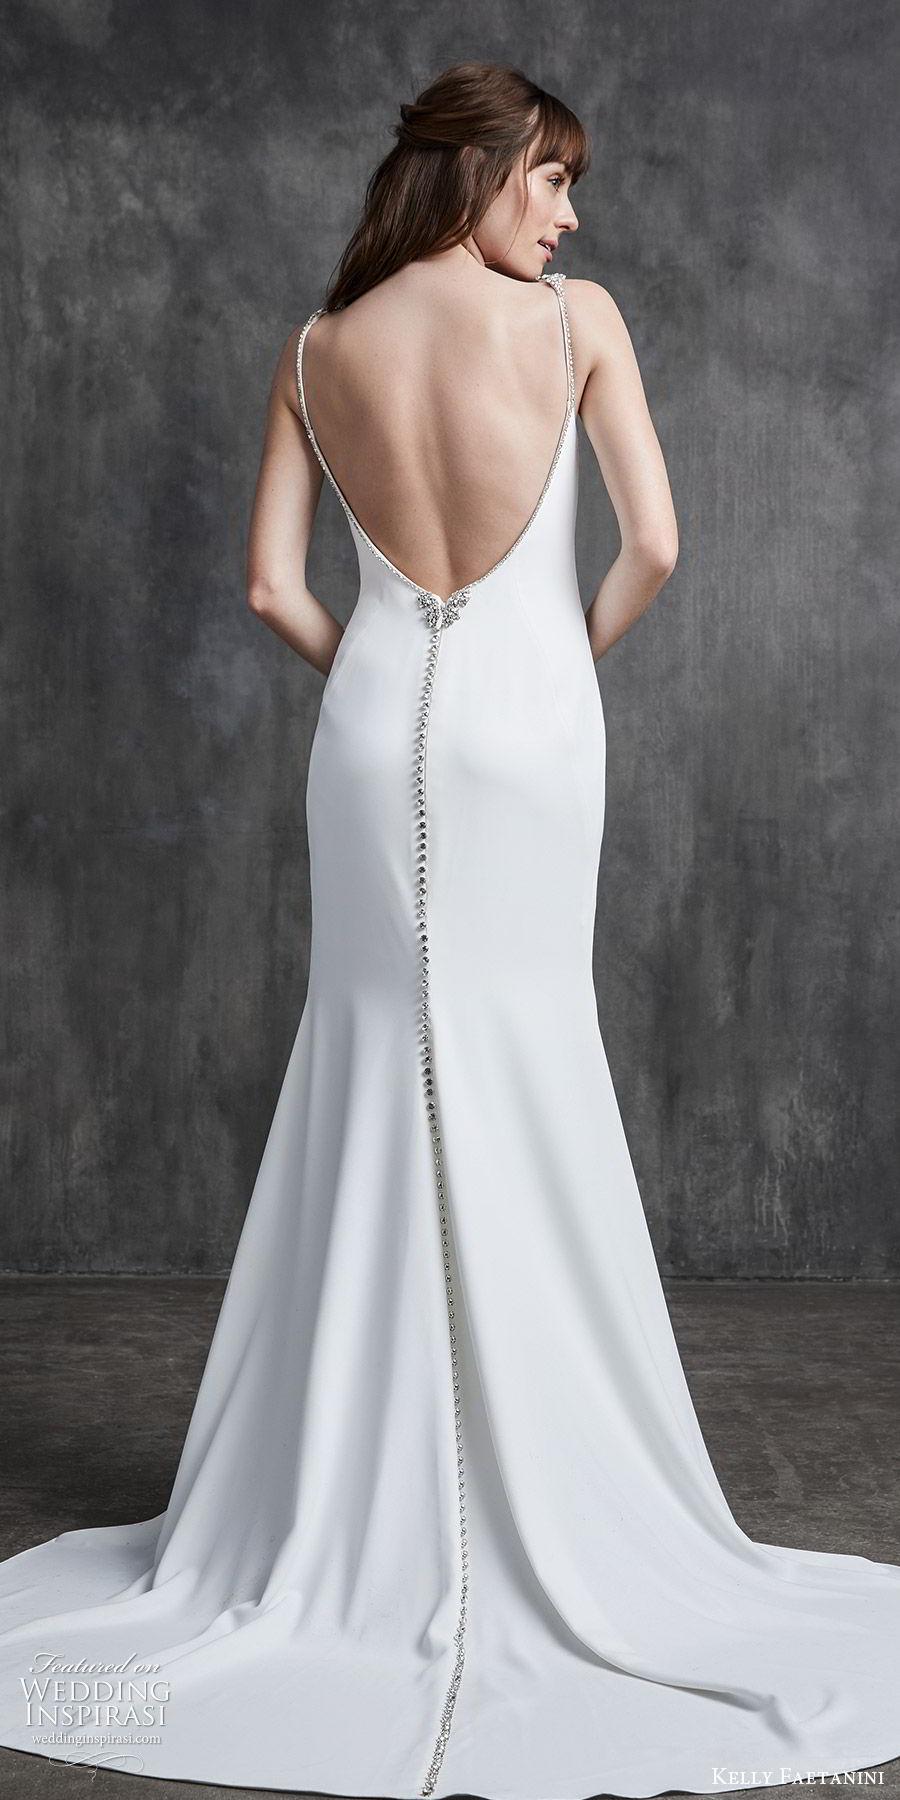 kelly faetanini spring 2020 bridal sleeveless beaded straps bateau neckline sheath wedding dress (10) low open back chapel train clean minimalist bv